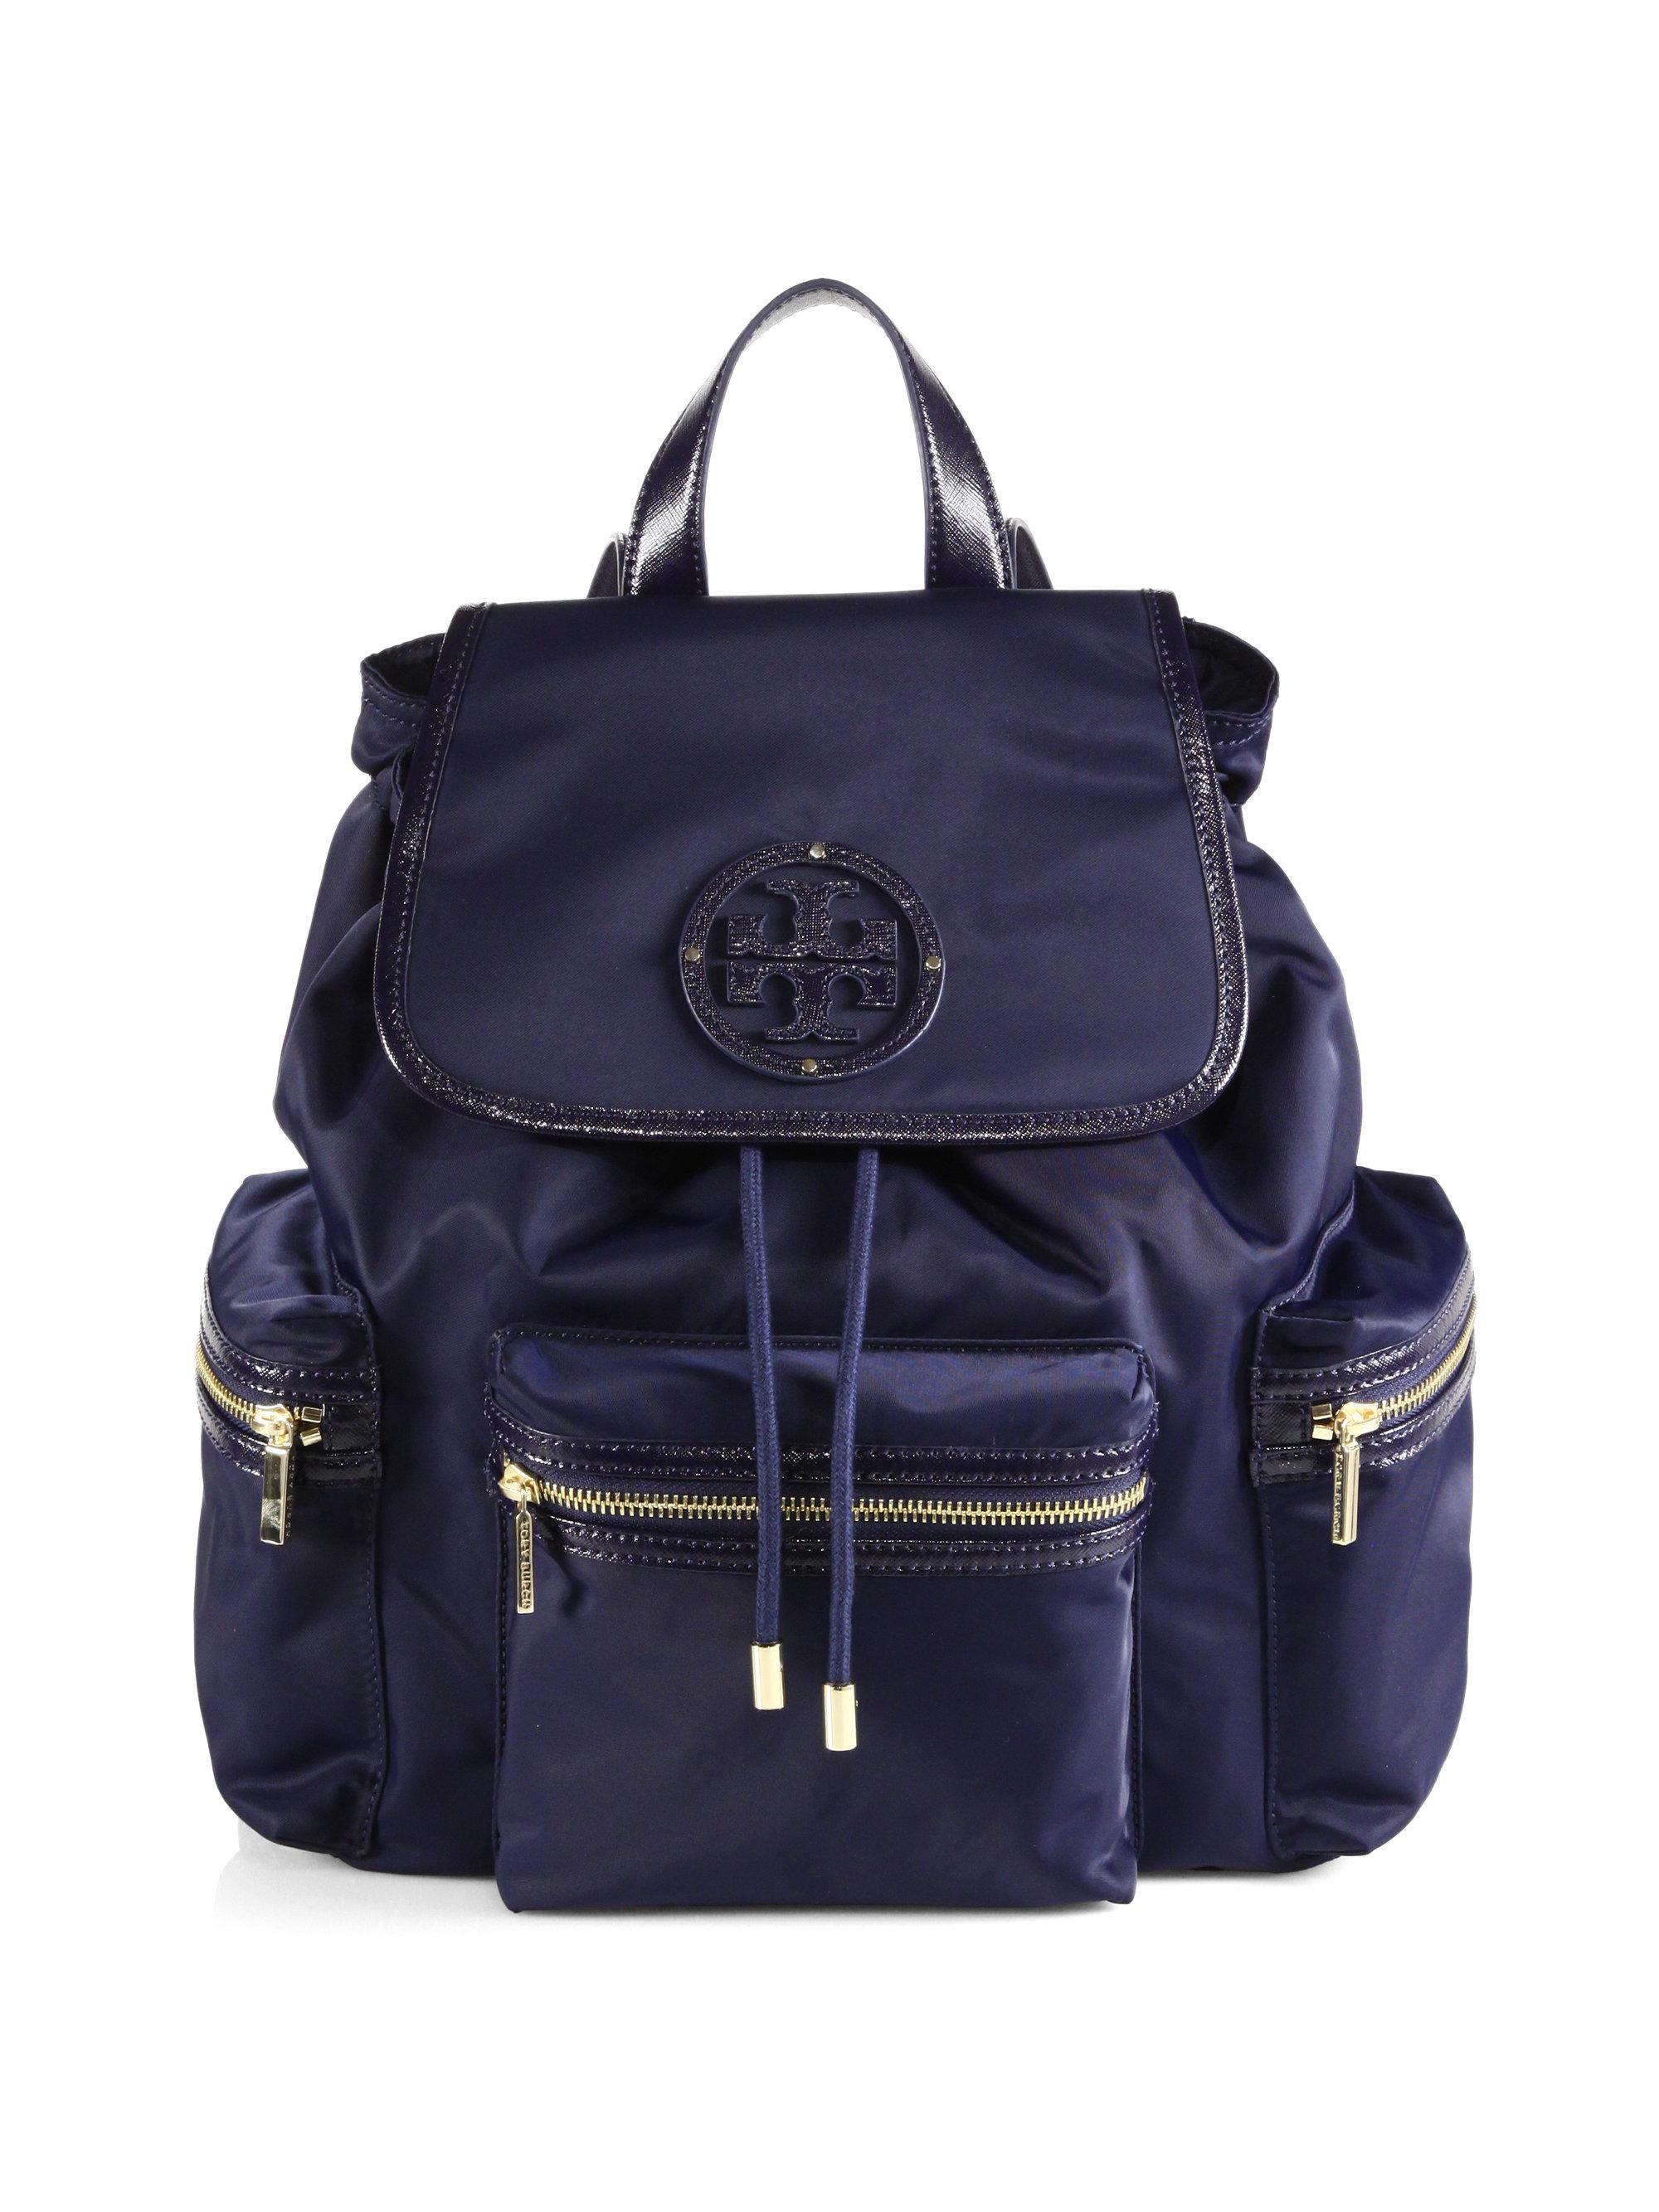 6c50e761bda Lyst - Tory Burch Bill Nylon Backpack in Blue